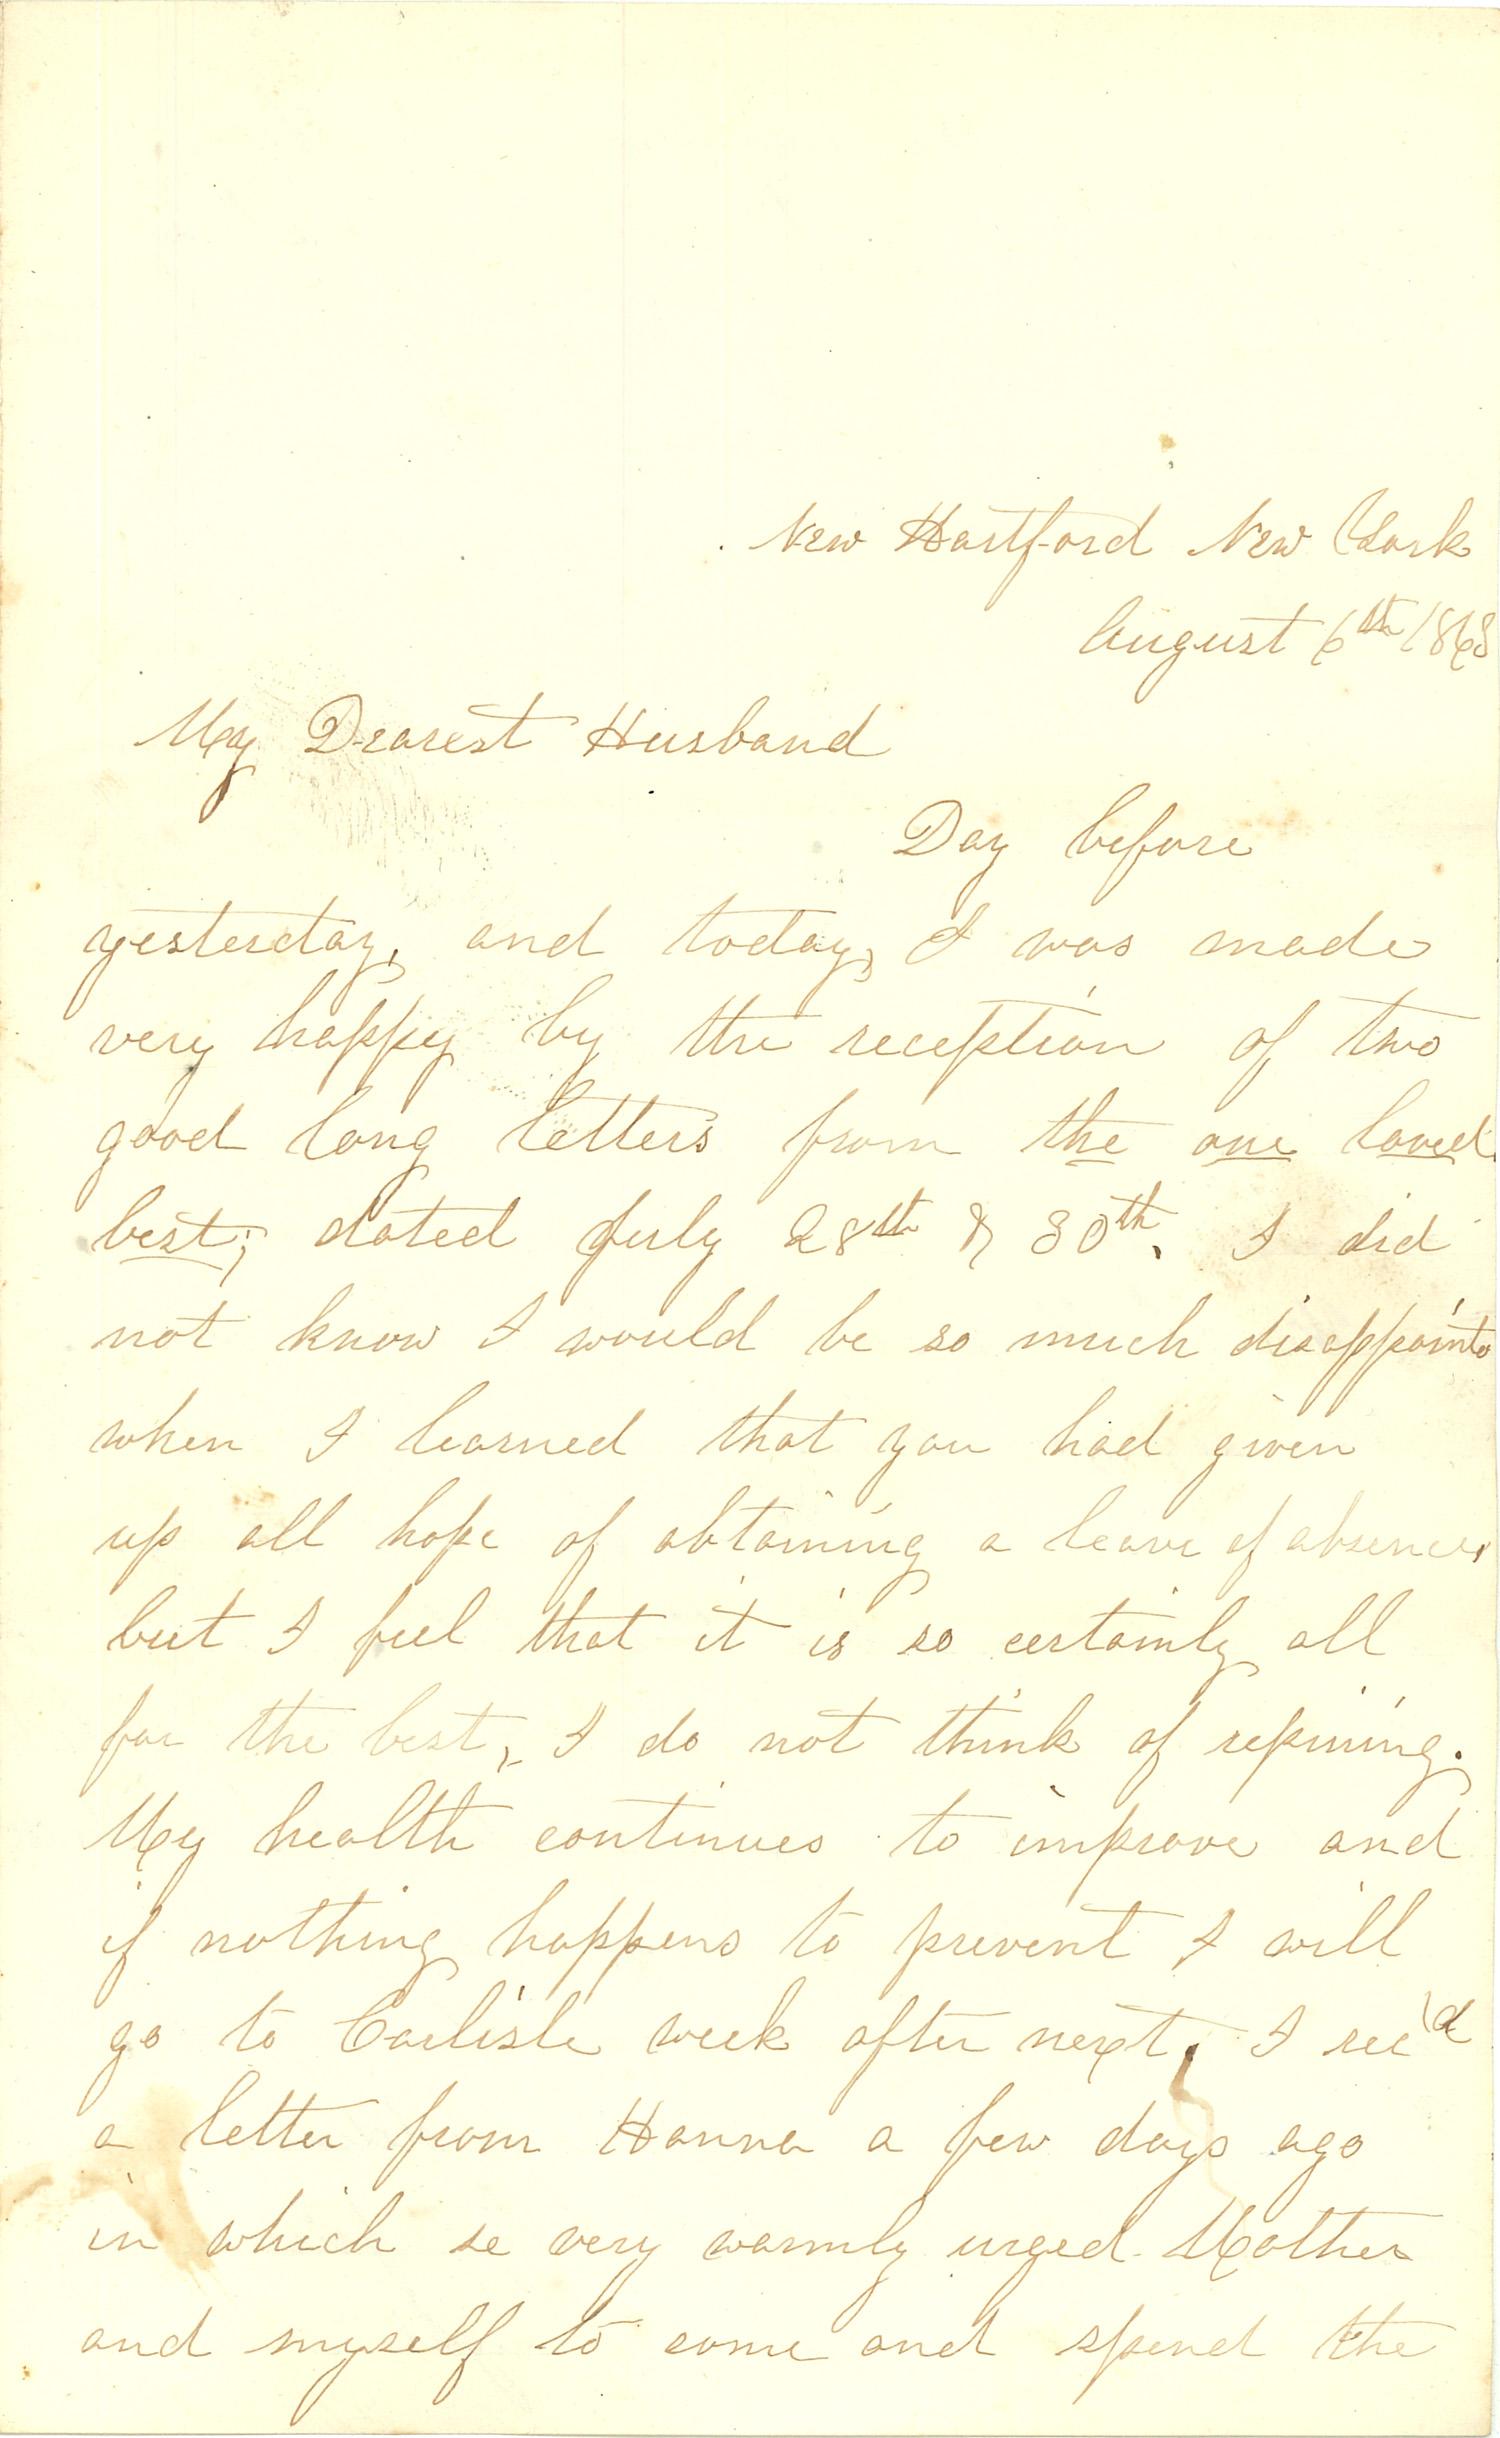 Joseph Culver Letter, August 6, 1863, Page 1